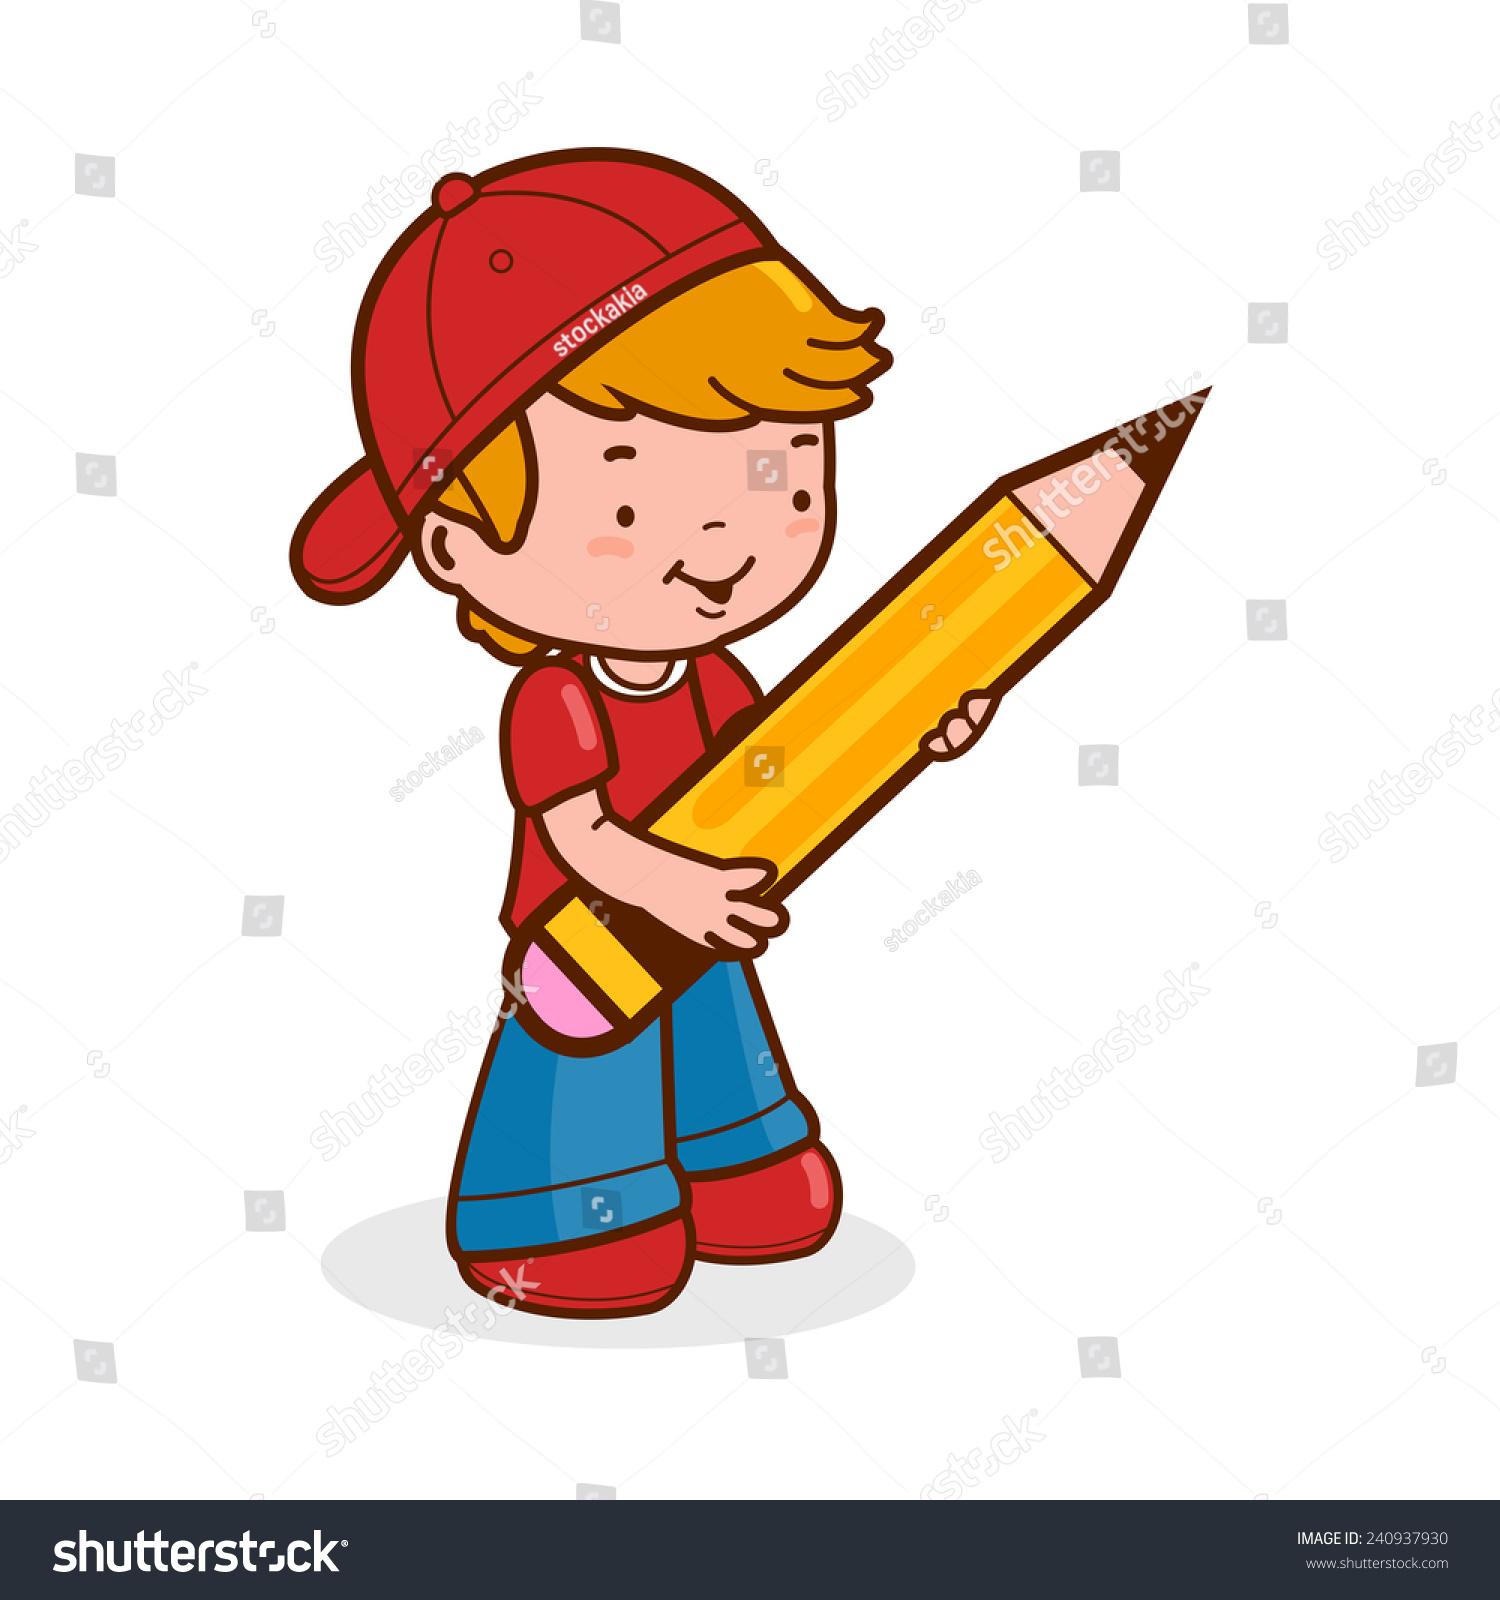 Boy student holding a big pencil